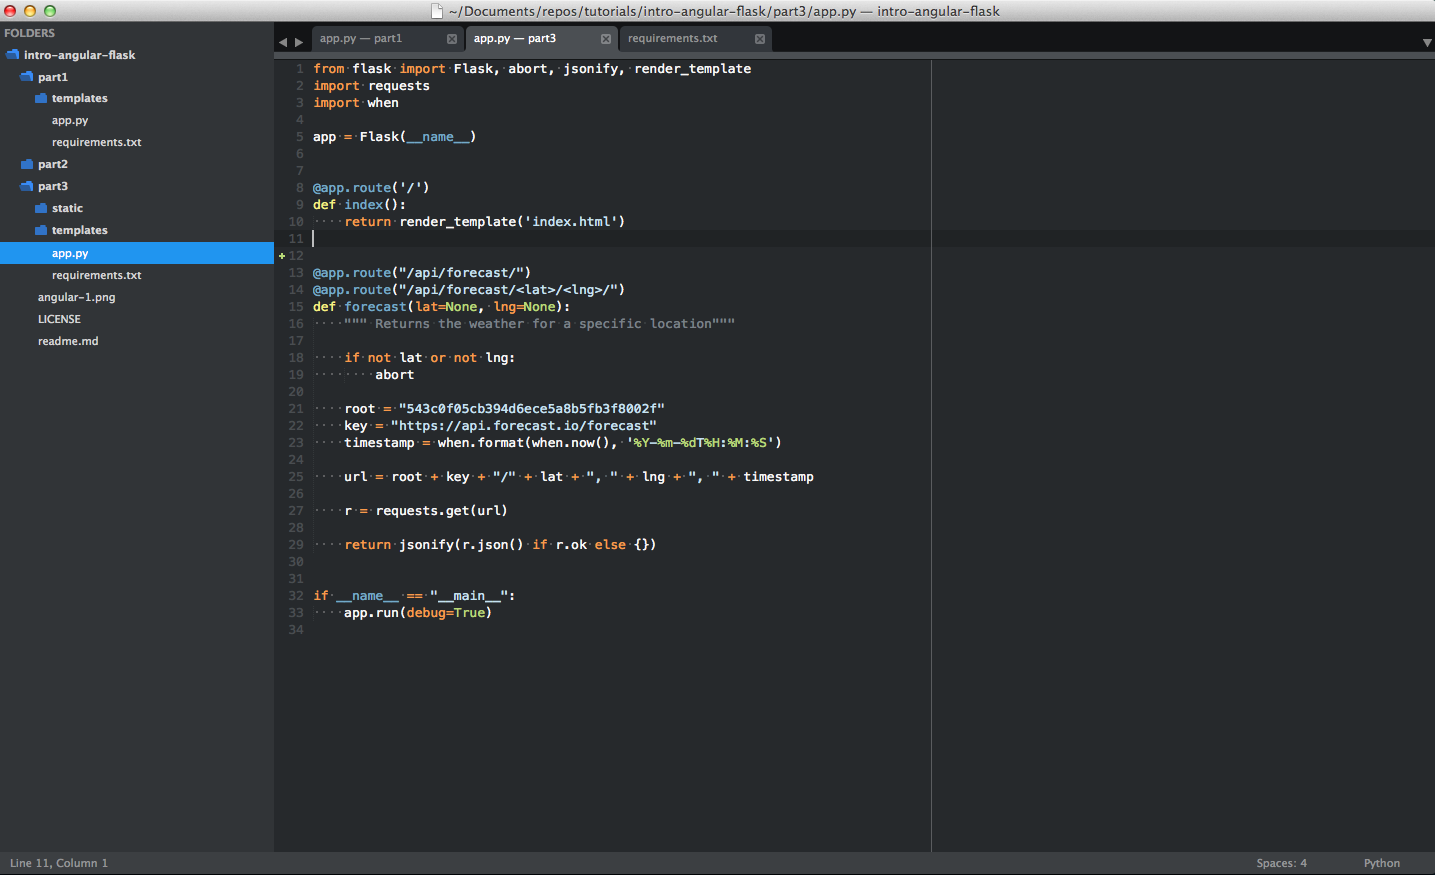 Sublime Text 3.2 Crack Build 3211 + License Key {100% Original 2020}